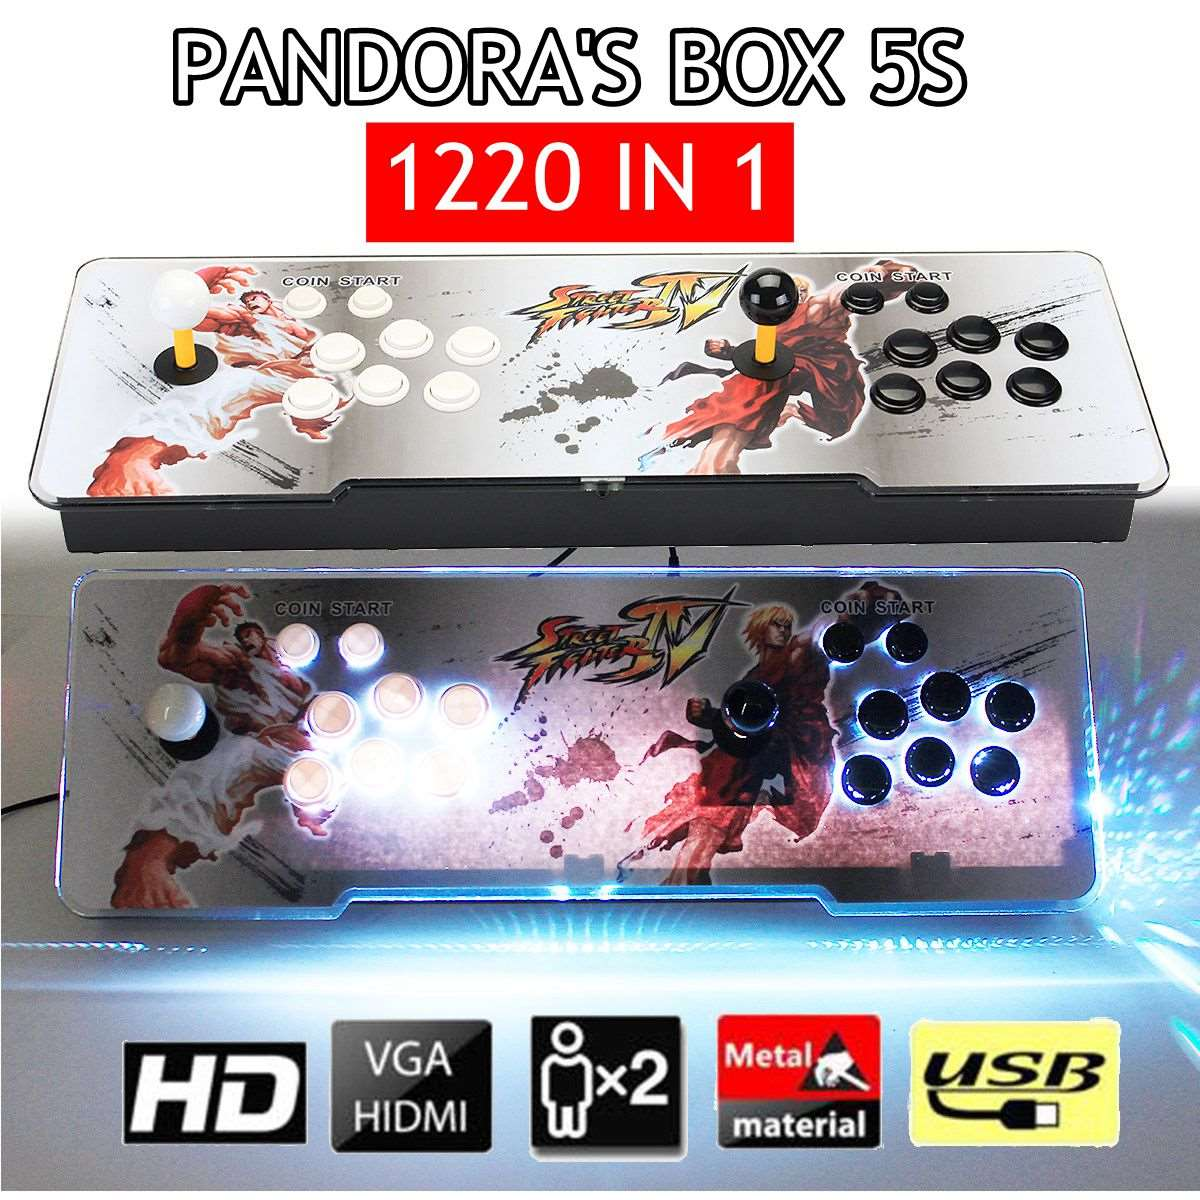 1220 in 1 Pandora's Box 5s Retro Video Games Double Stick Arcade Console Light PC LCD Machine VGA, HDMI, USB, AUX games lile aux prepositions